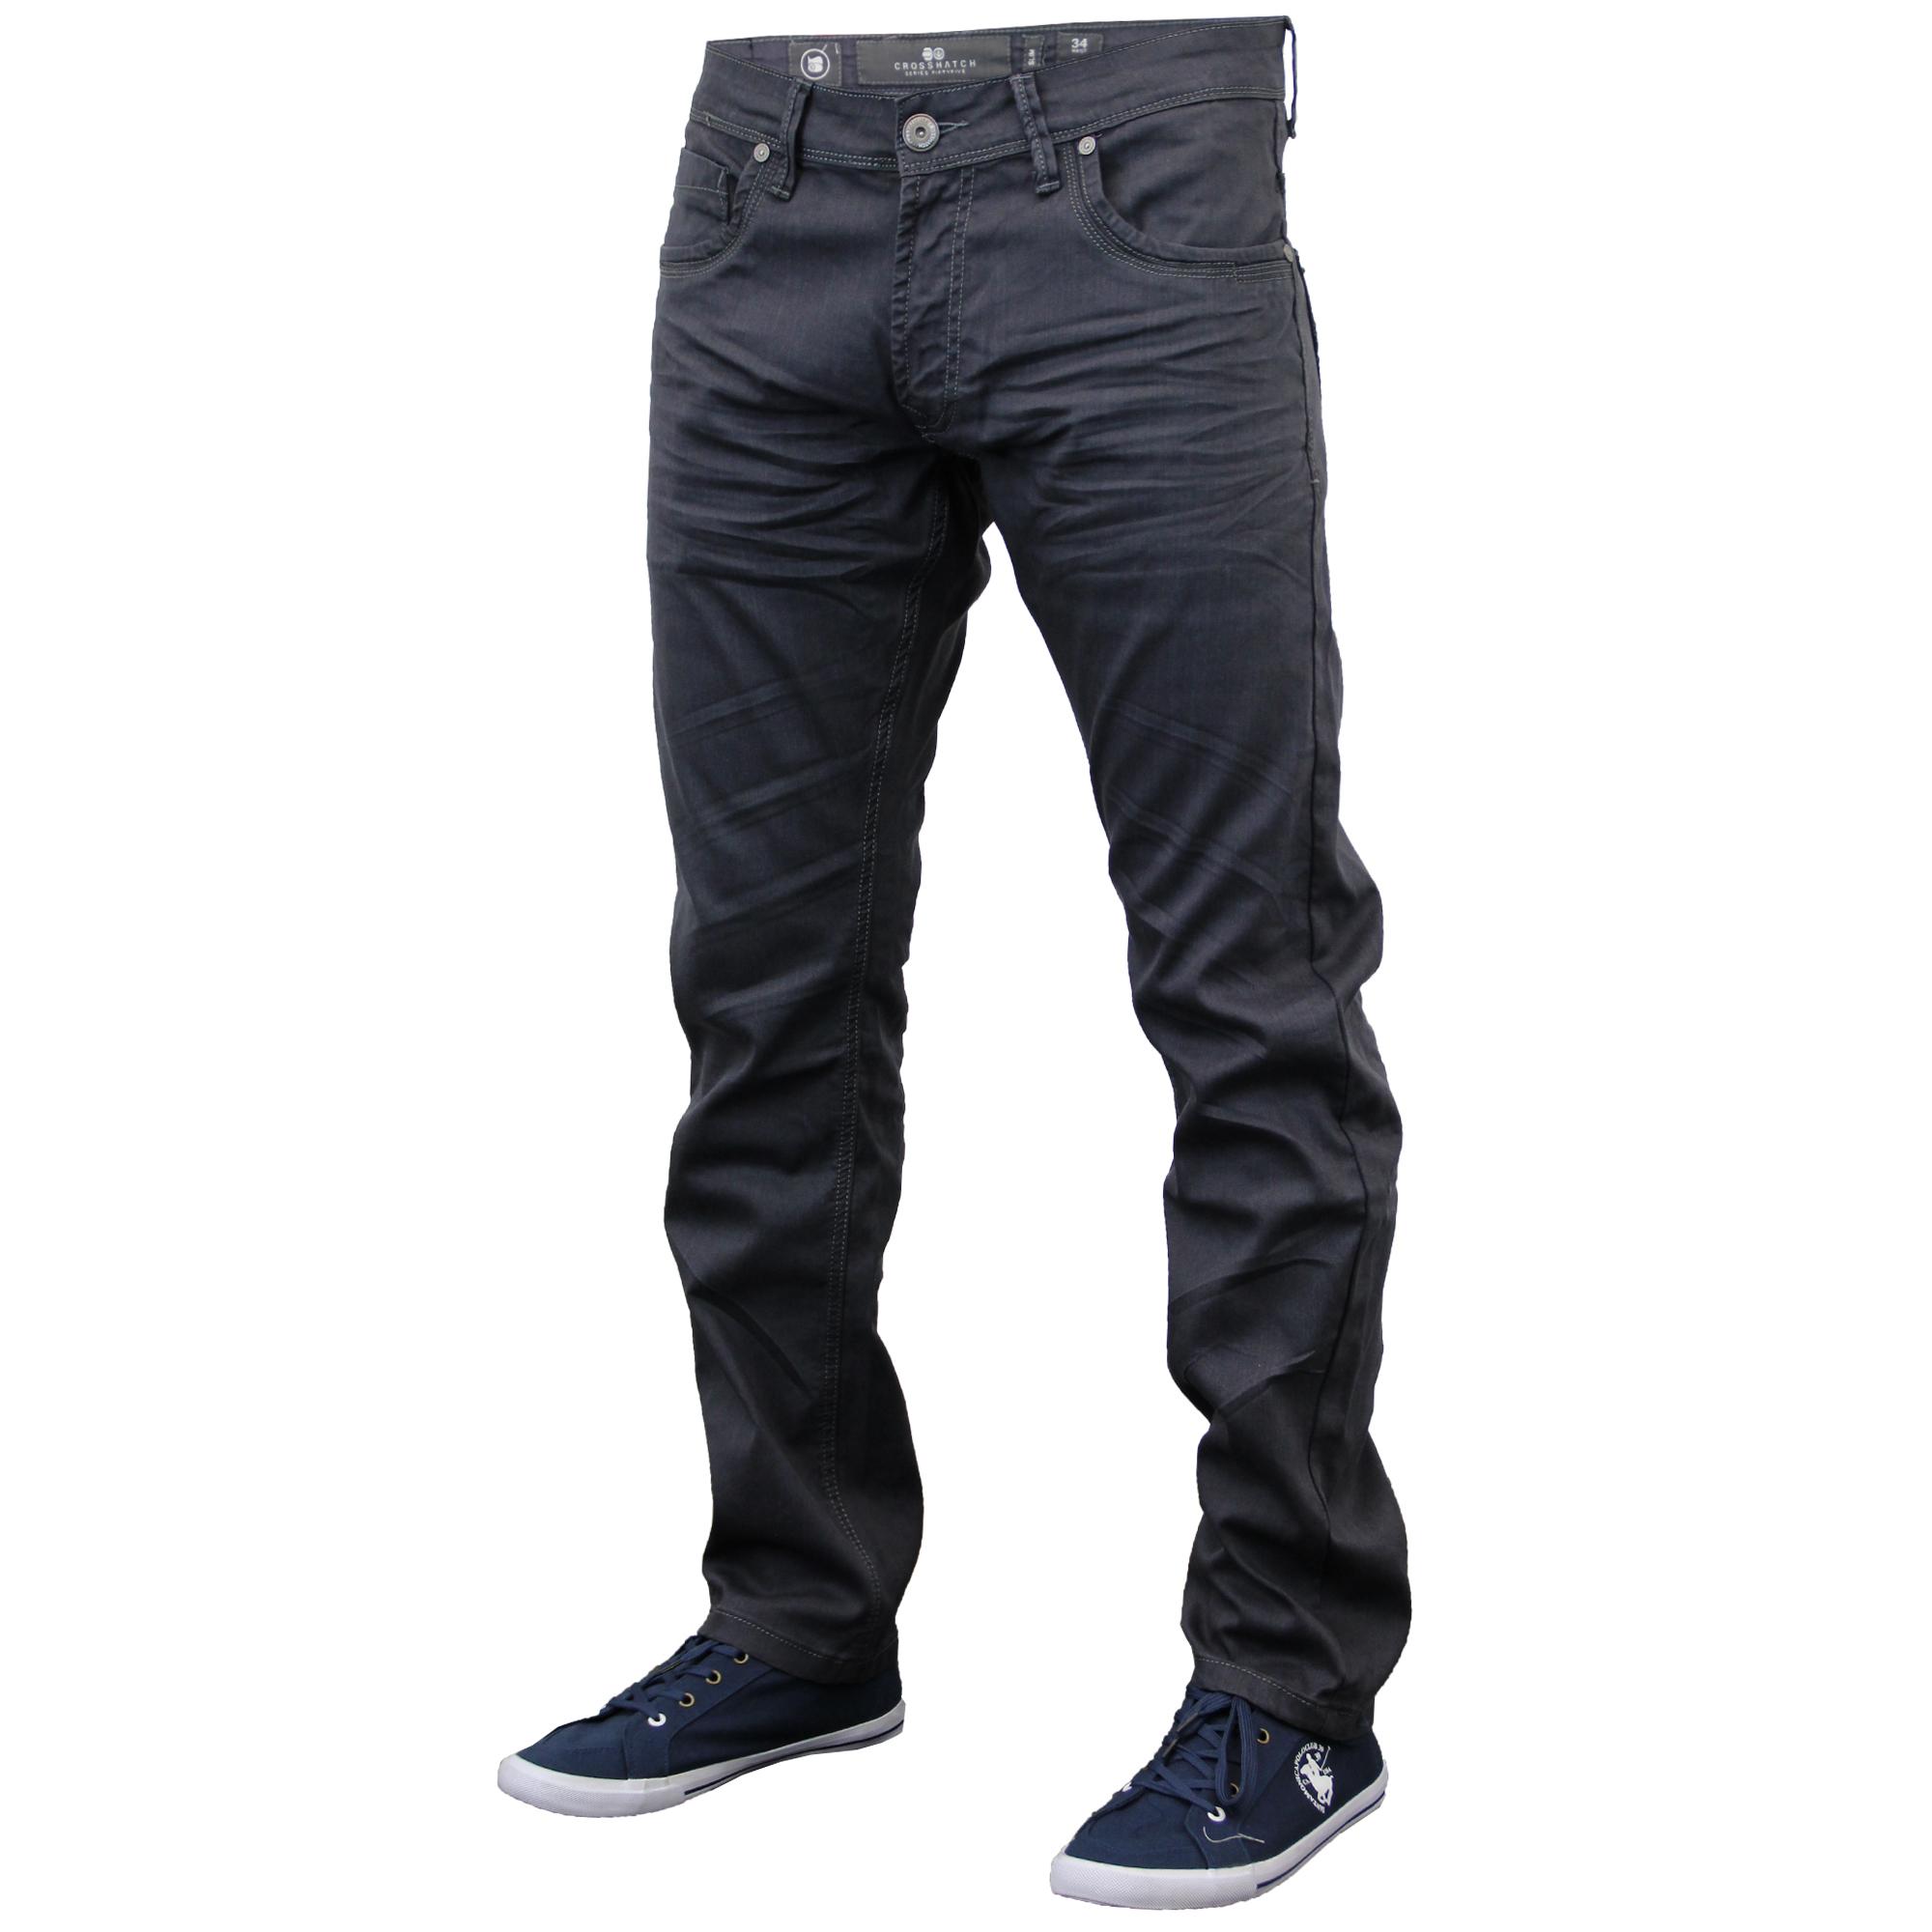 Cj Black Jeans Mens